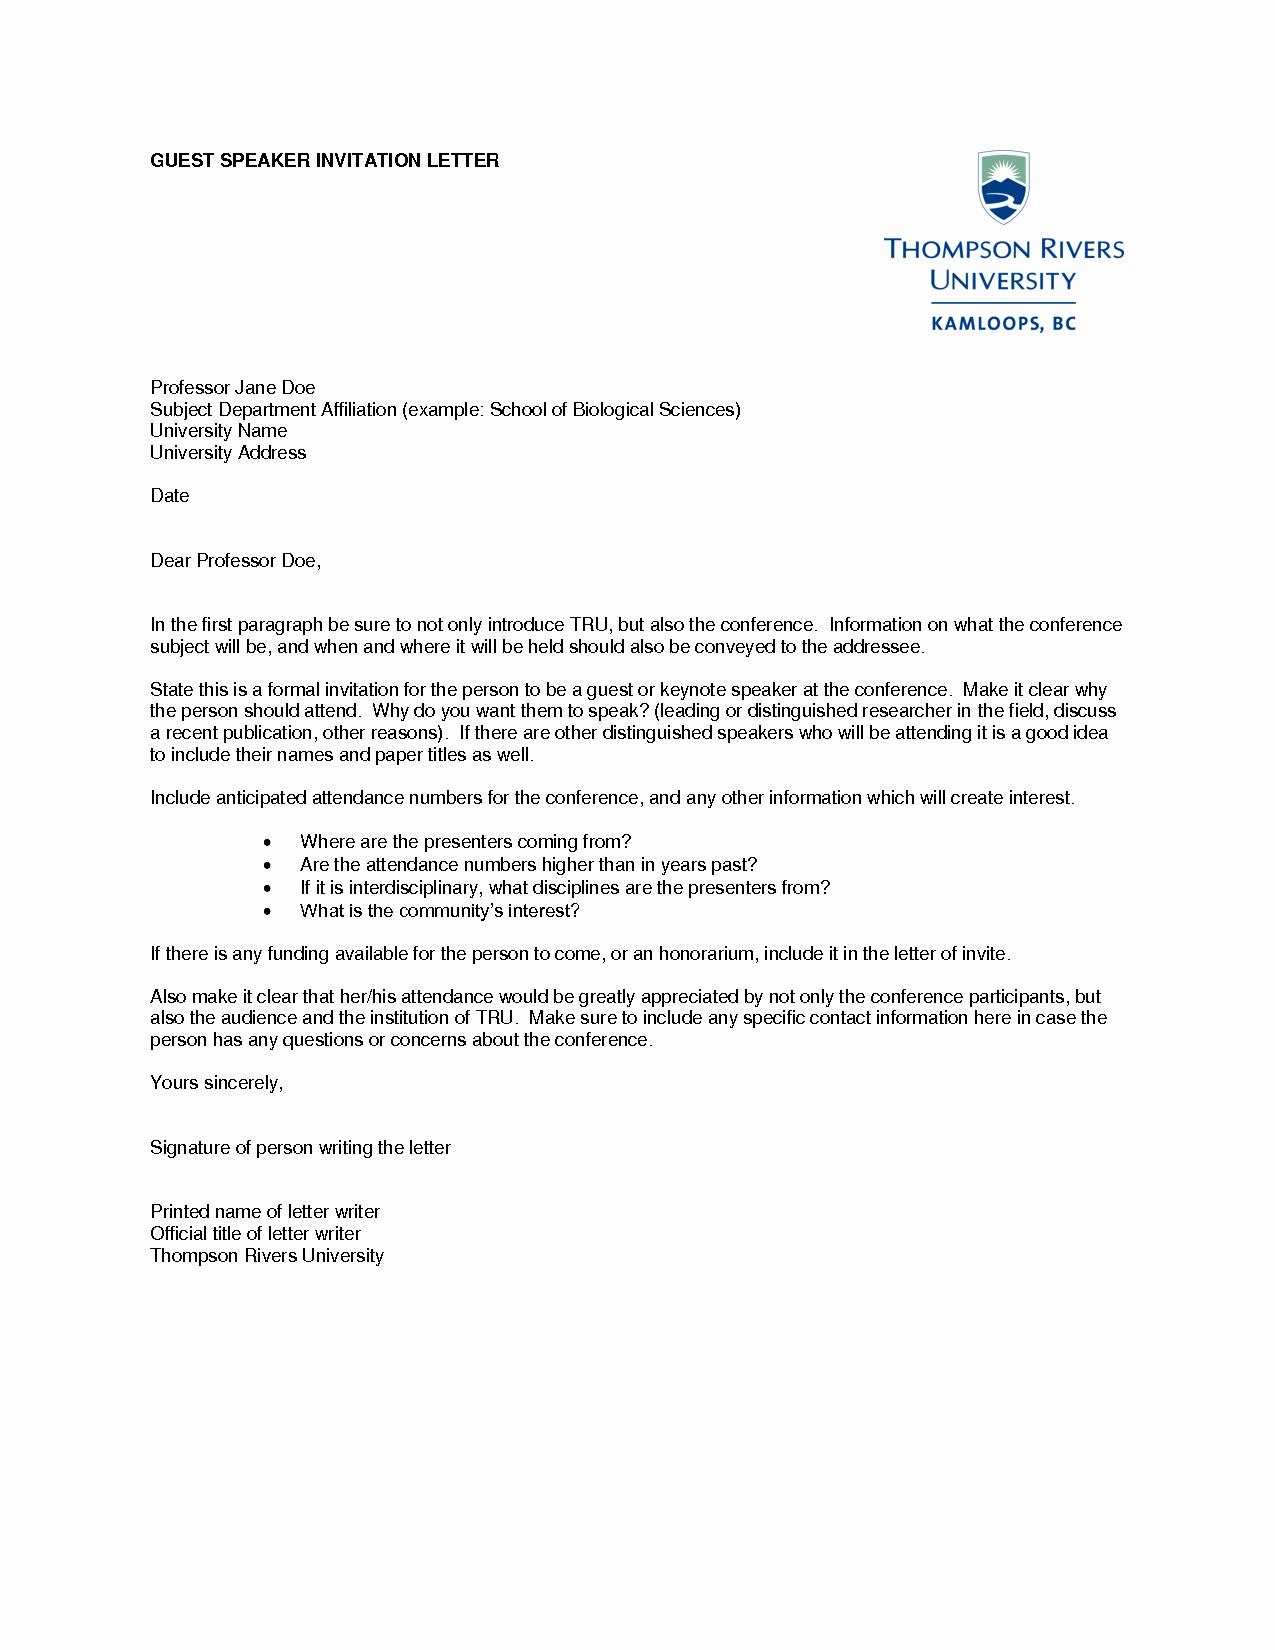 Graduation Invitation Letter Sample Inspirational Graduation Invitation Examples